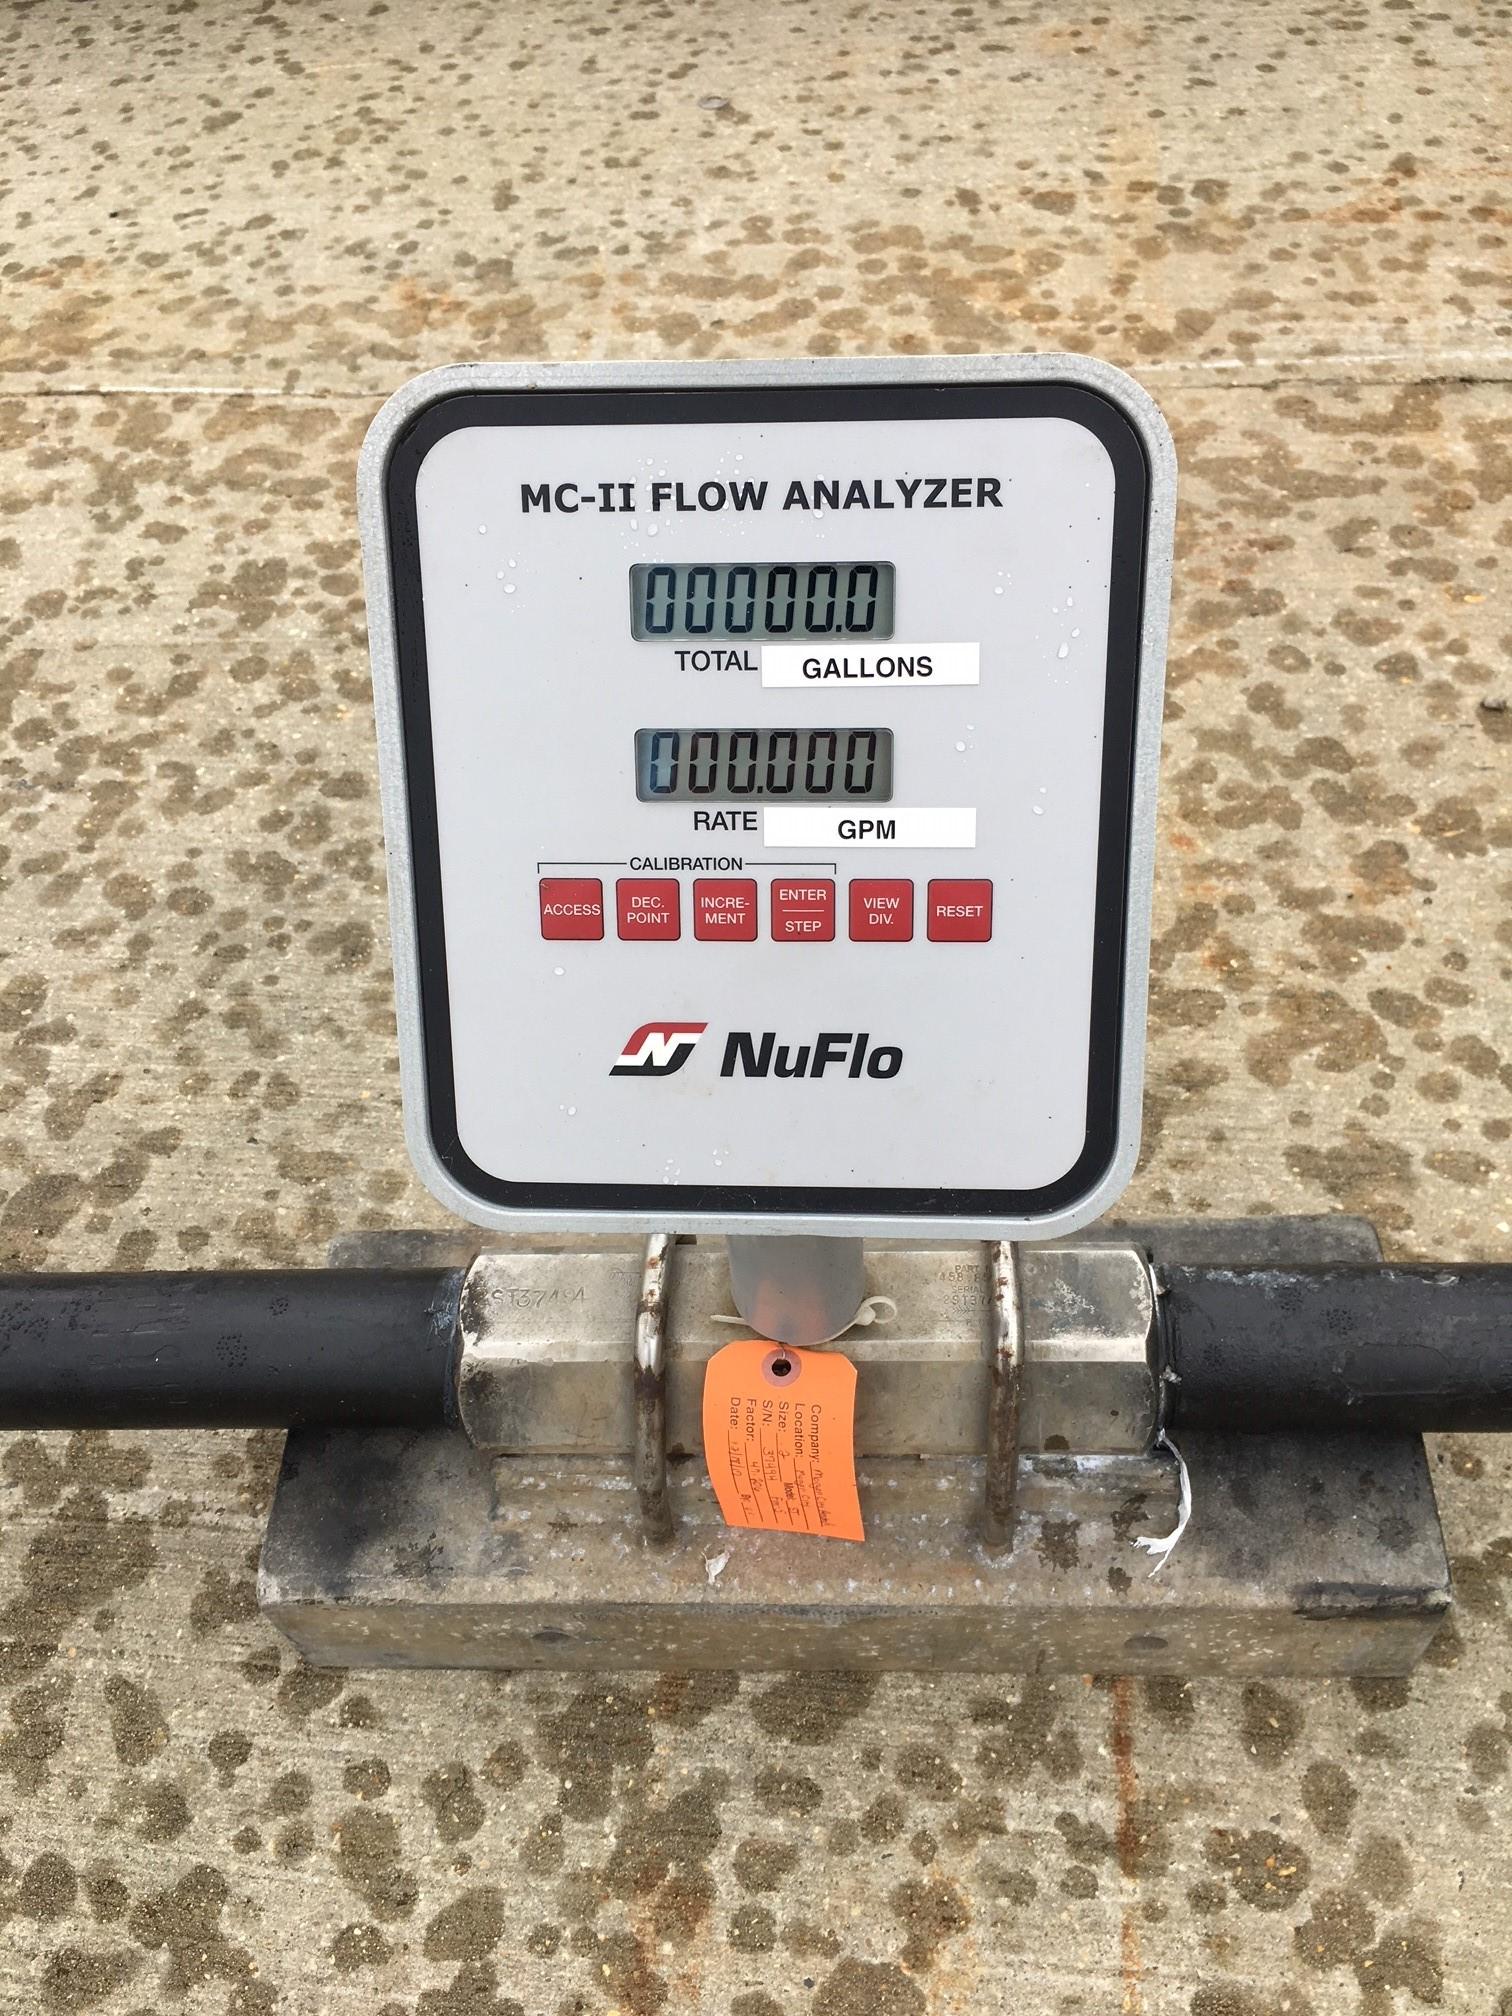 NuFlo meters